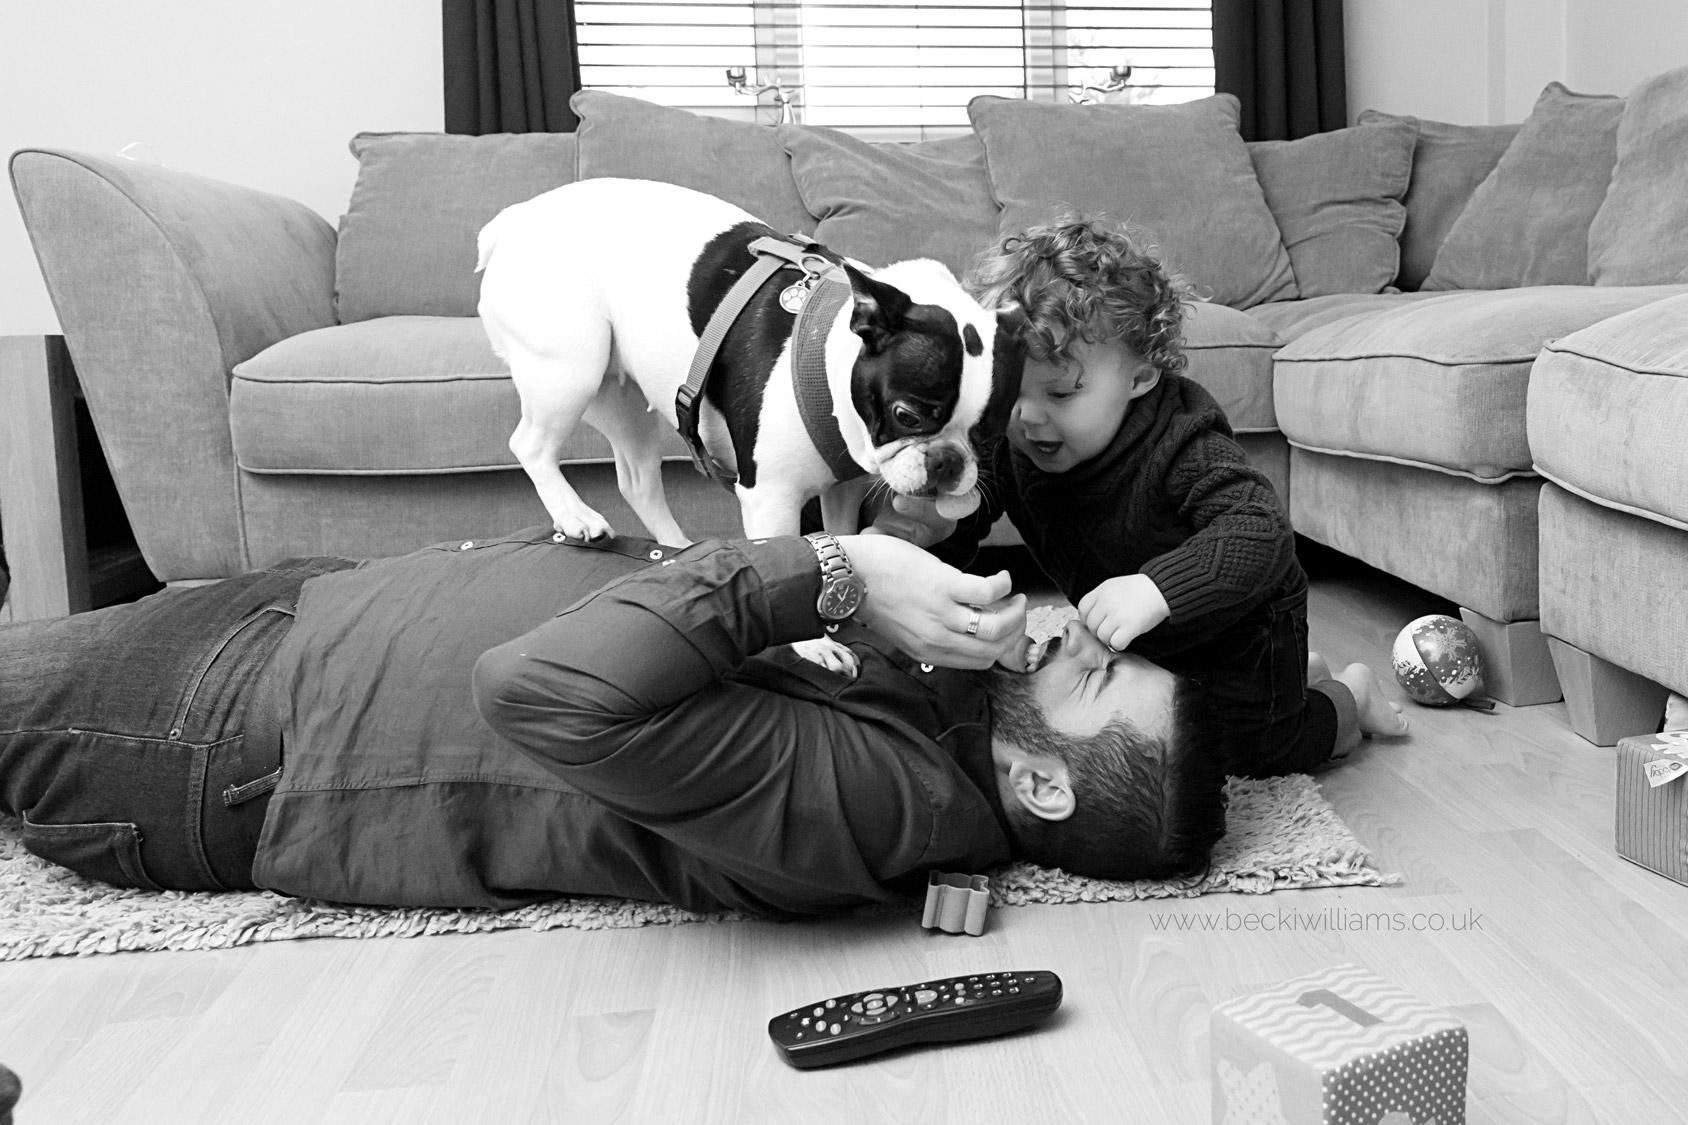 family-photographer-hemel-hempstead-dad-dog-fun-playing